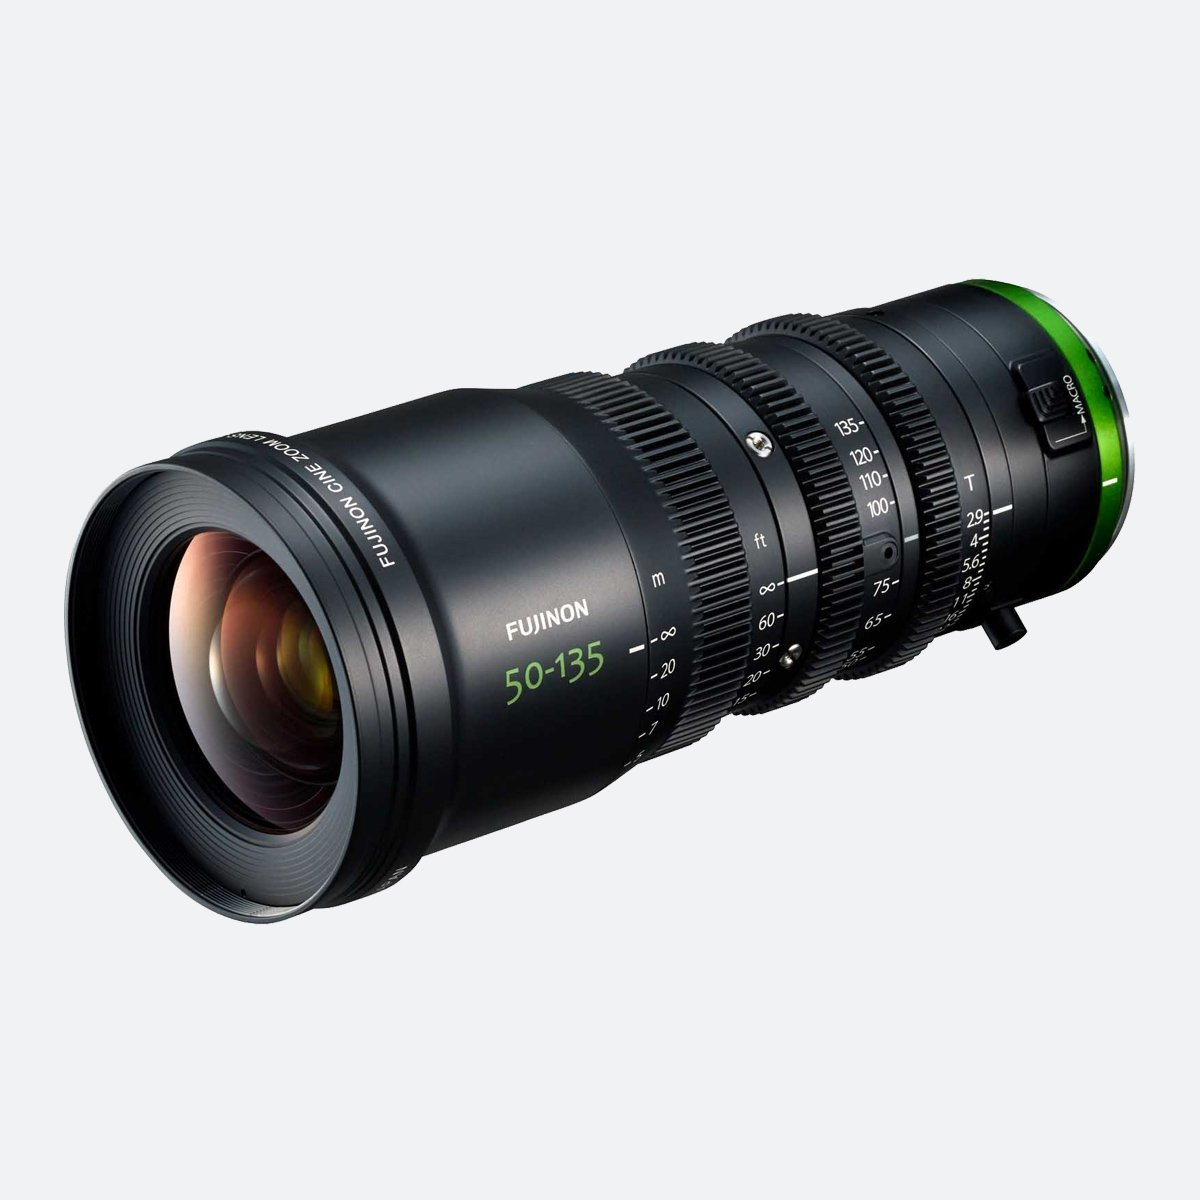 Fujinon MK50-135mm T2.9 E-mount Cine Lens